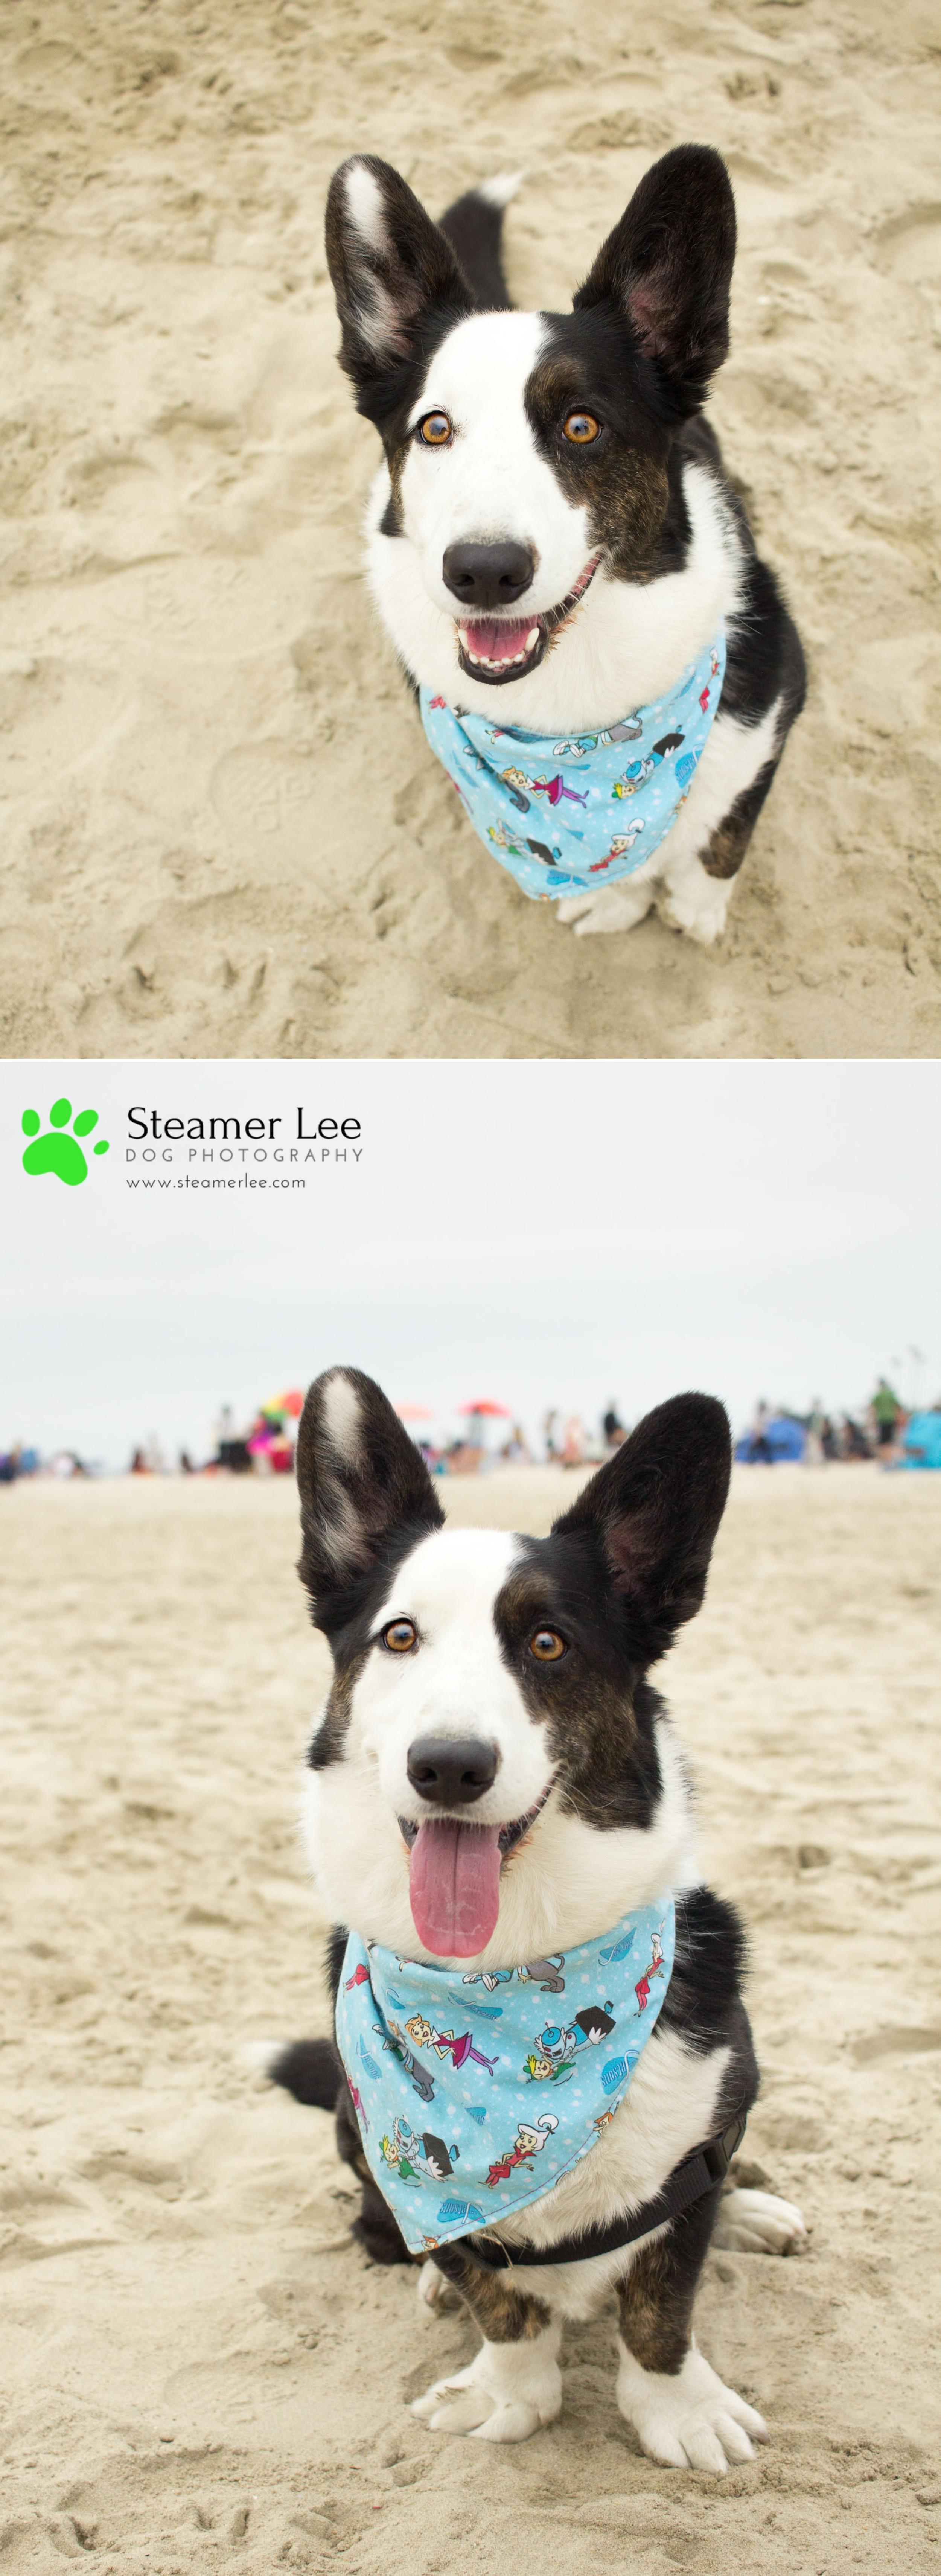 Steamer Lee Dog Photography - July 2017 So Cal Corgi Beach Day - Vol.2 - 1.jpg